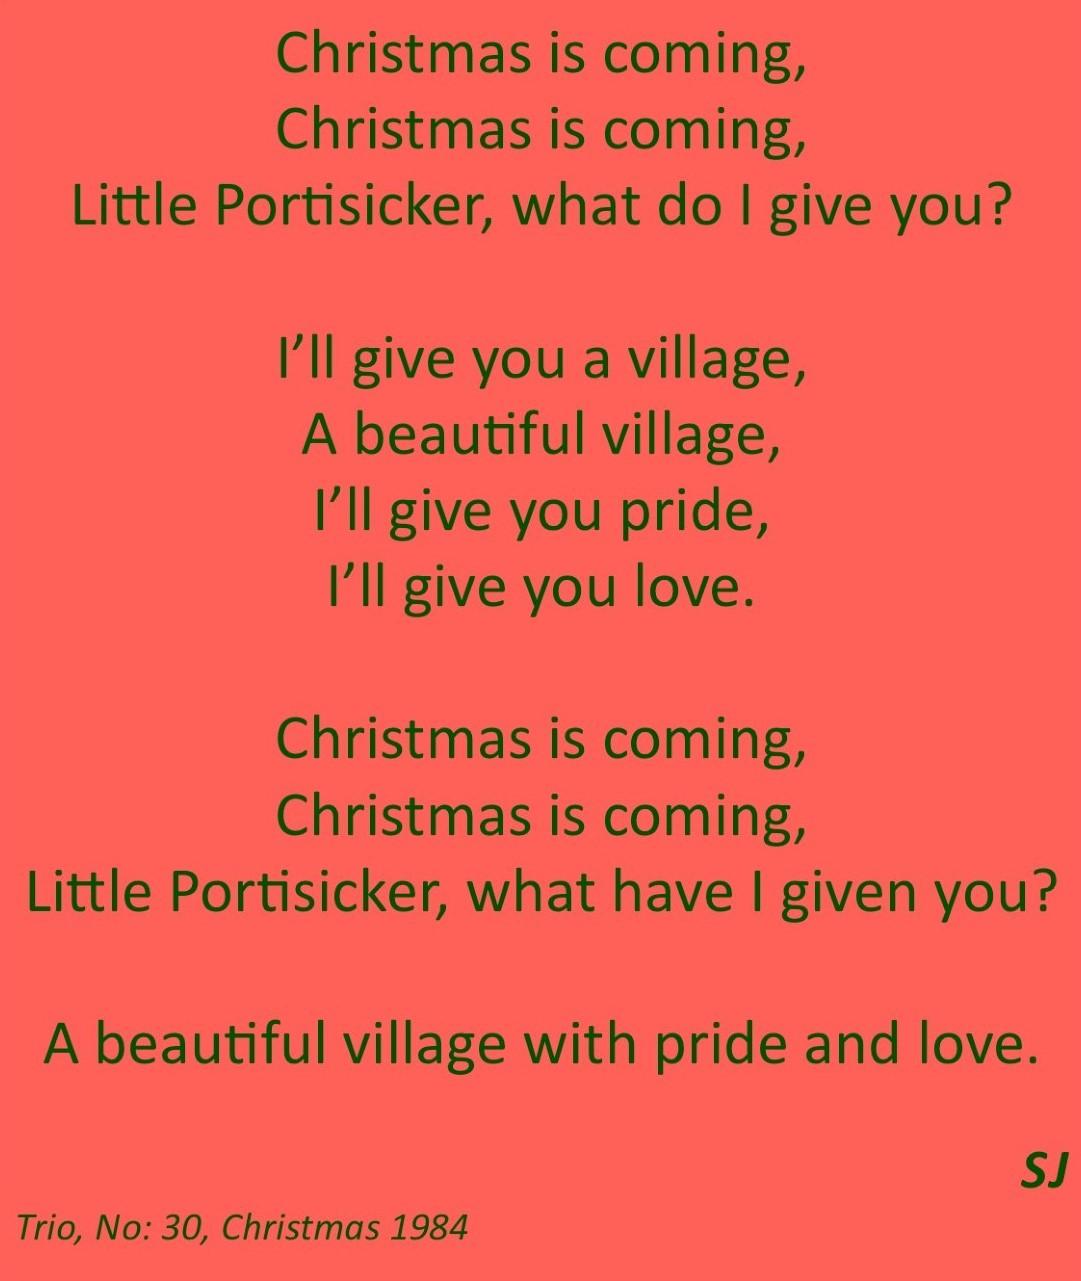 Christmas is coming …